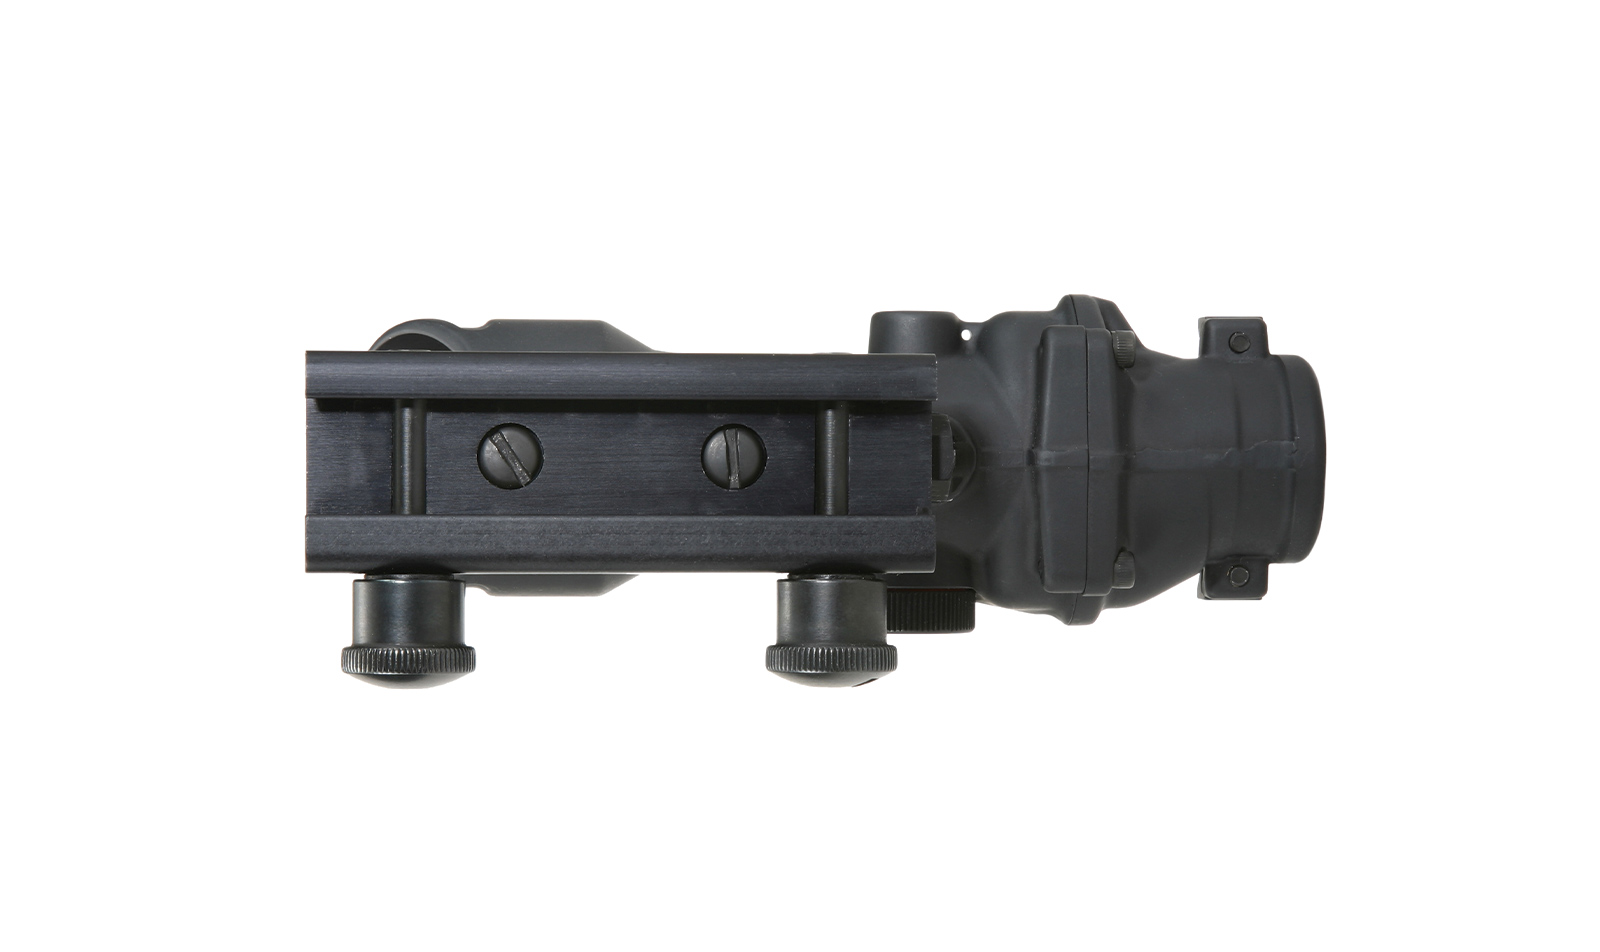 TA31-C-100550 angle 10